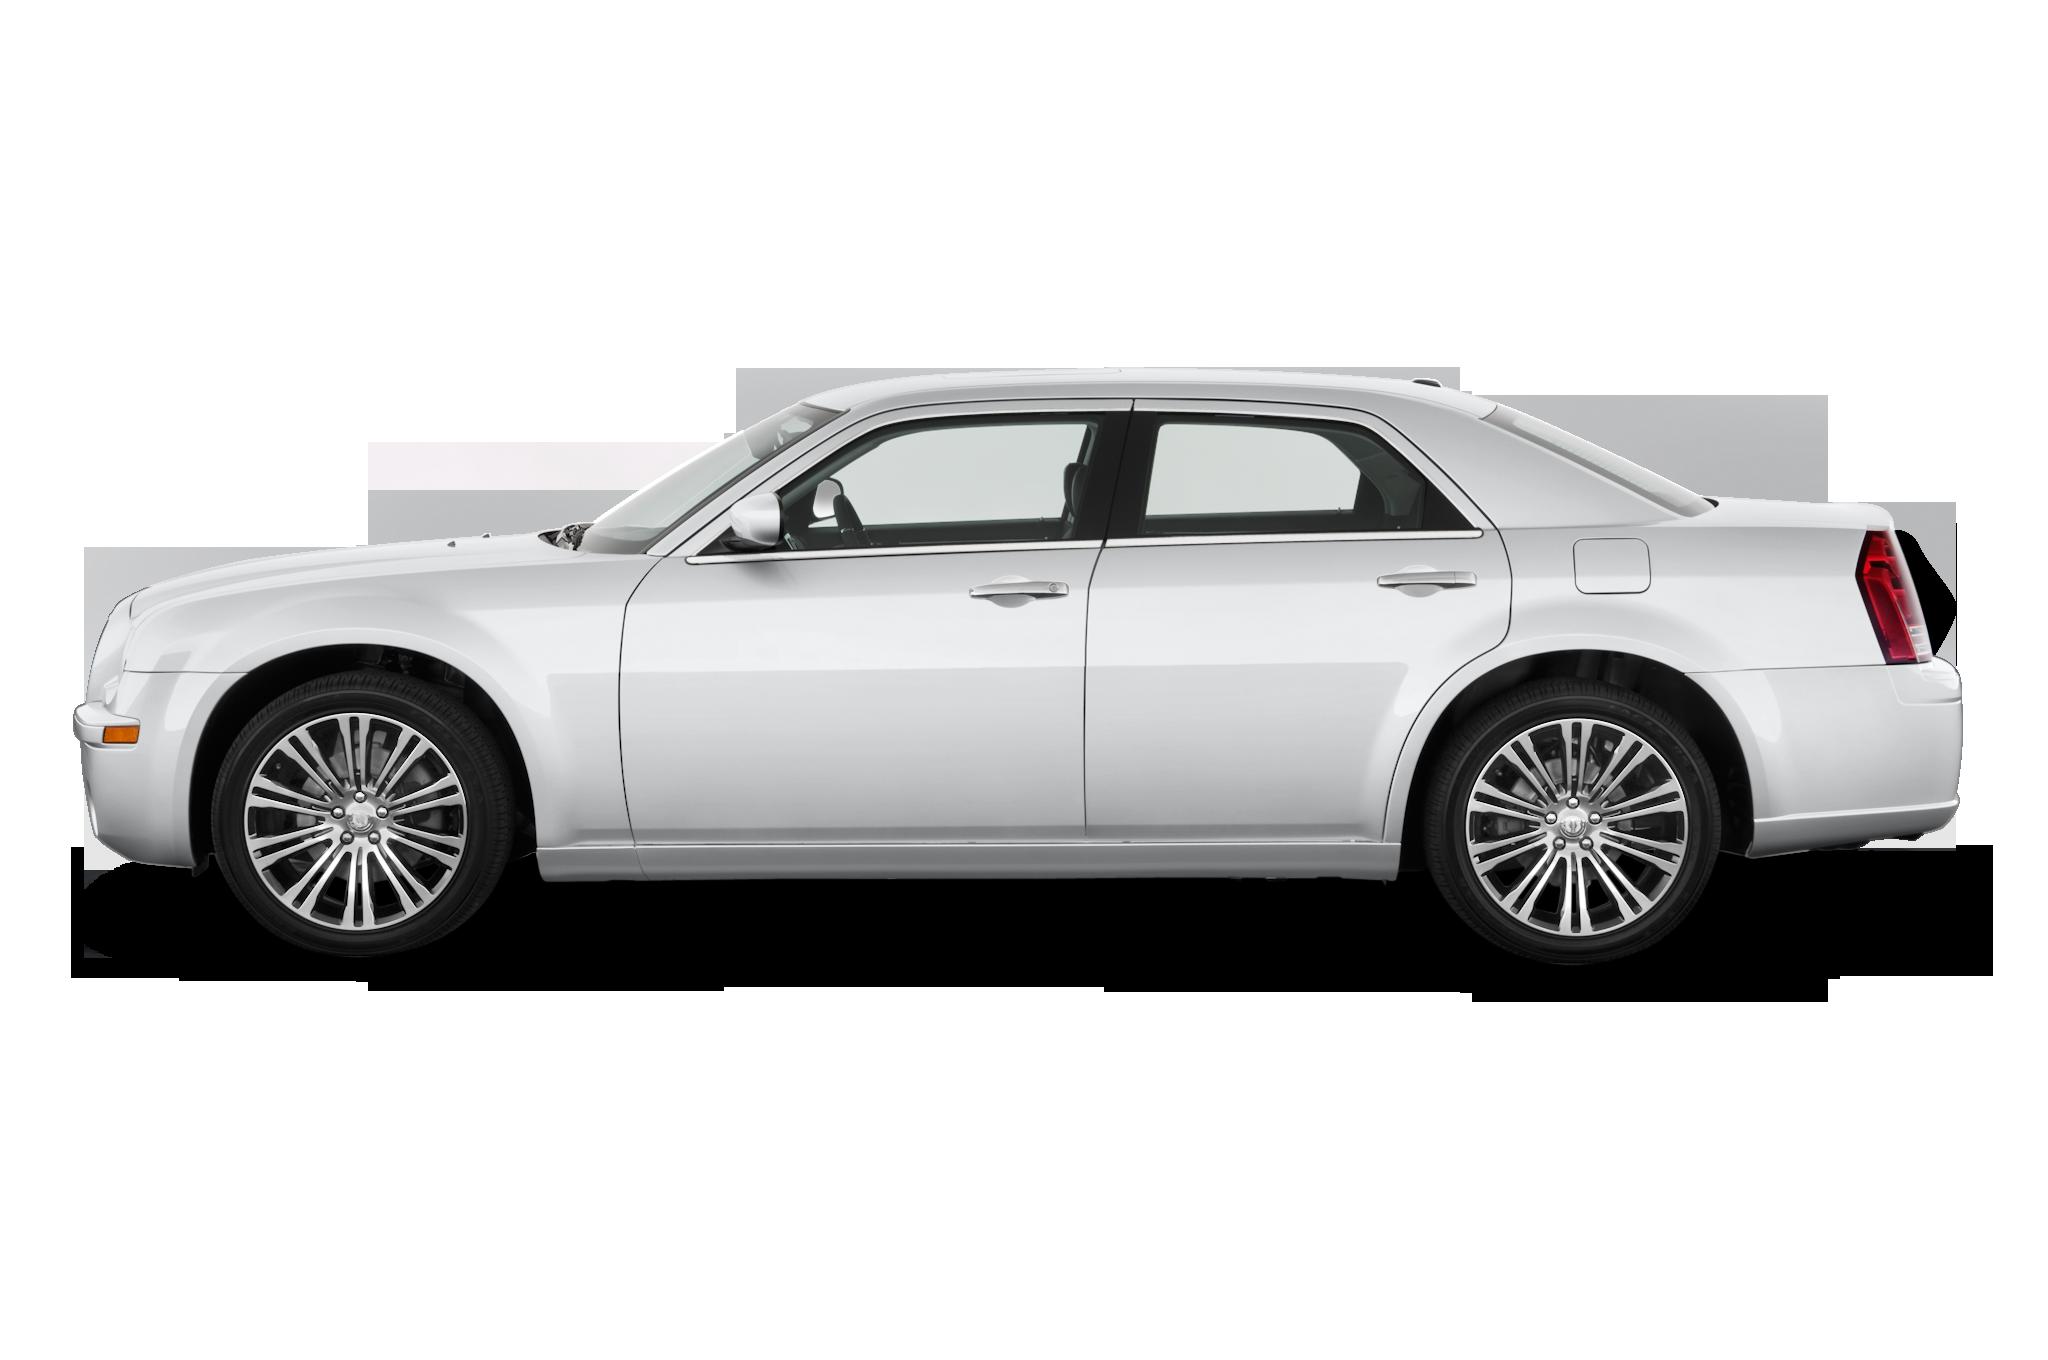 2010 chrysler 300 s v8 sedan side view recall central chrysler recalls expand to wrangler, minivans; bmw  at alyssarenee.co